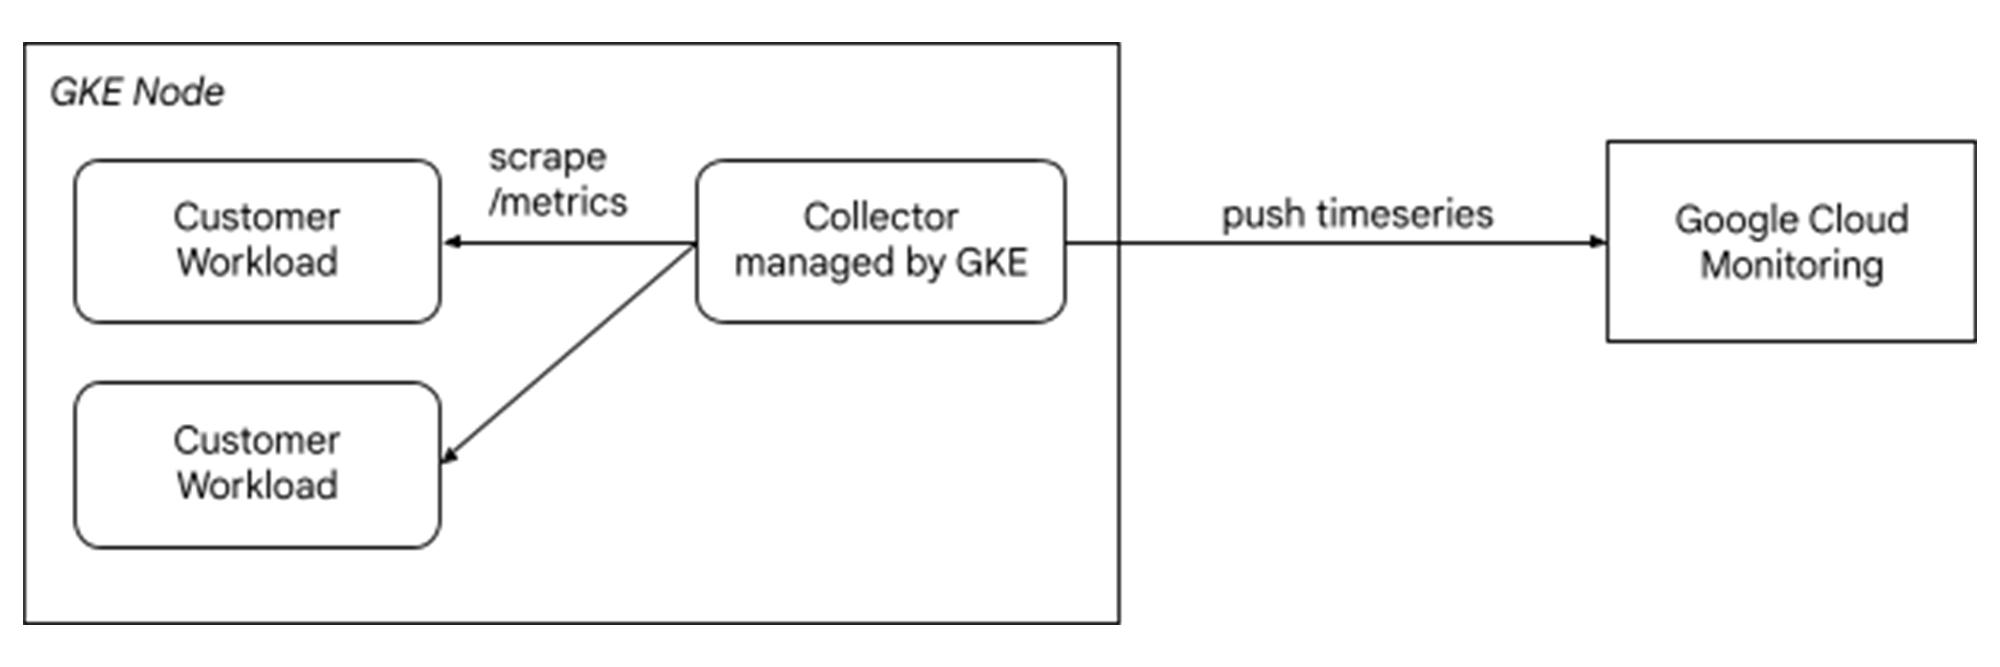 gke node.jpg